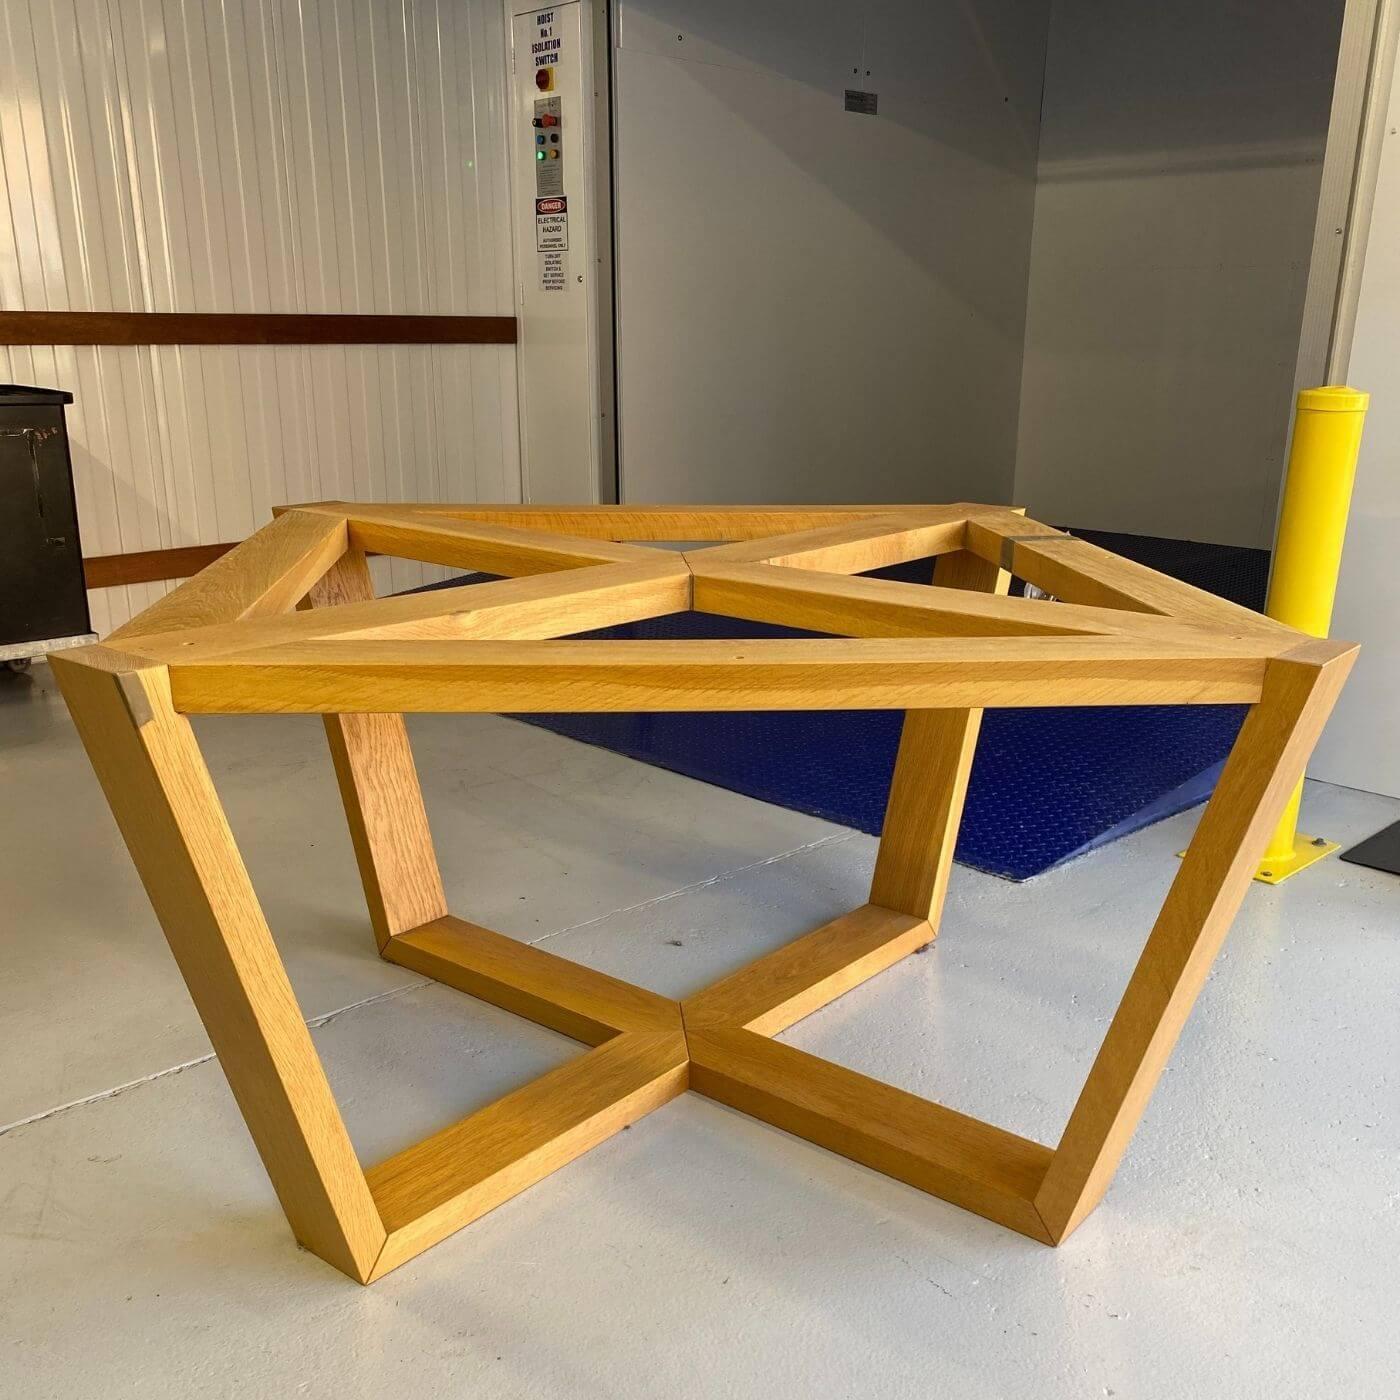 Lowe via Hub Furniture Atticus dining table, round